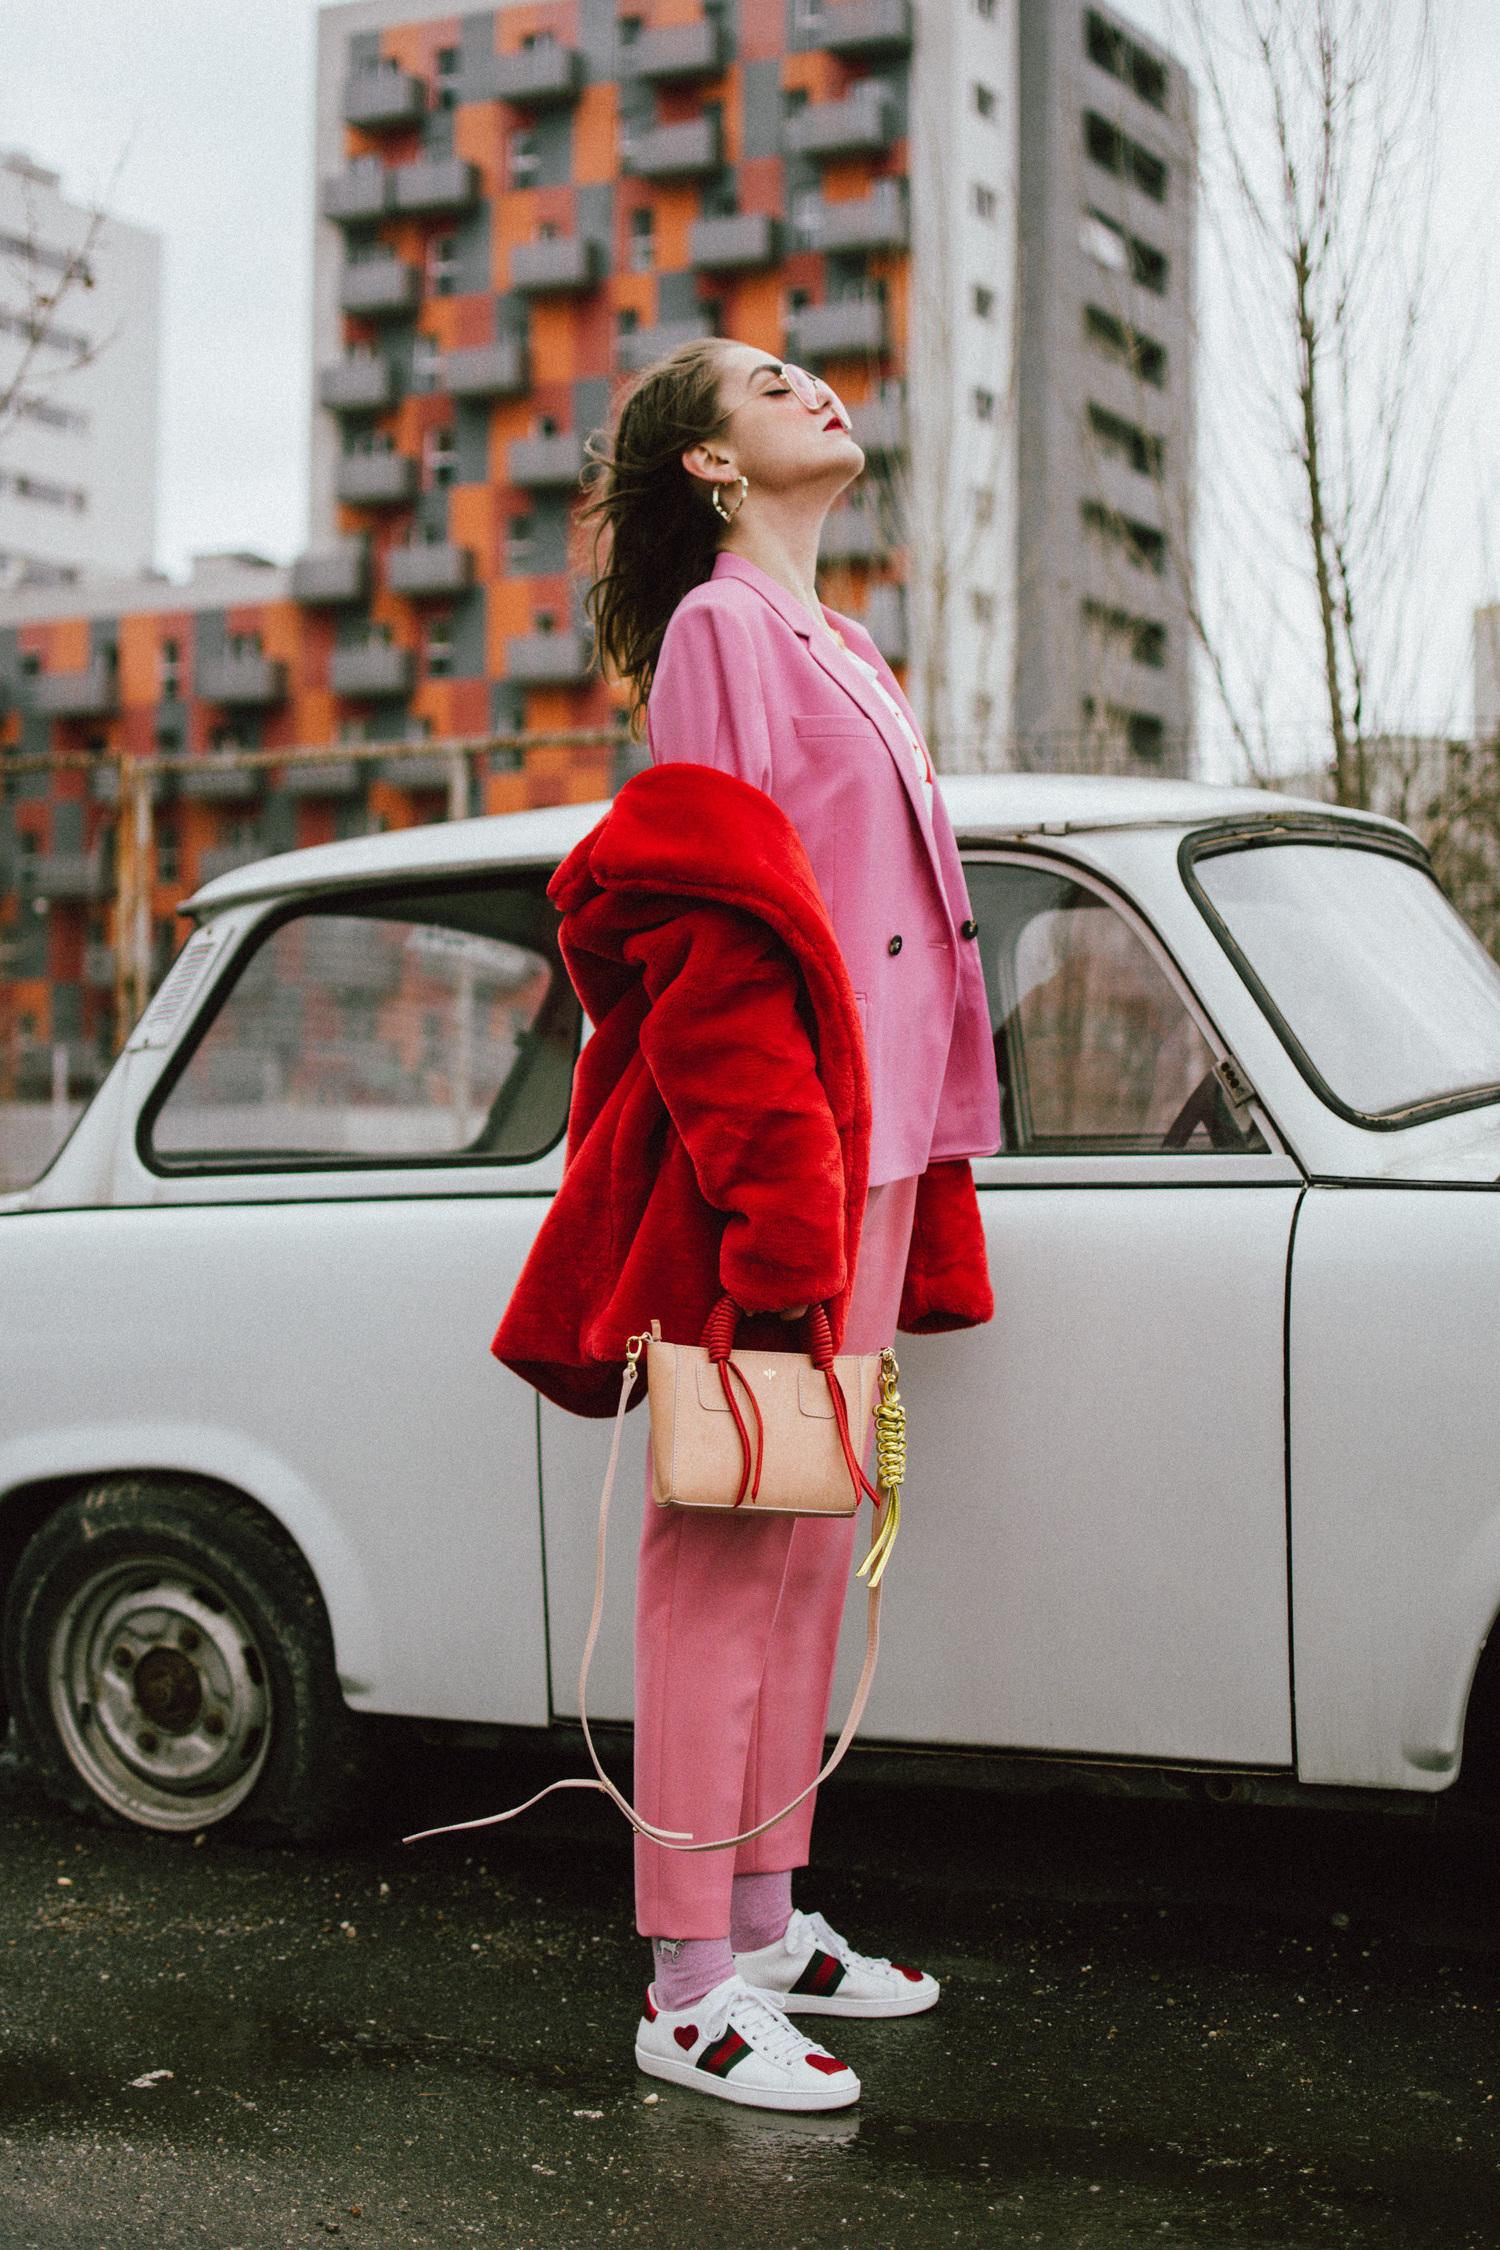 Herbst Outfit im trendigen Rot - komplette Outfits Damen mit weißen Sneakers